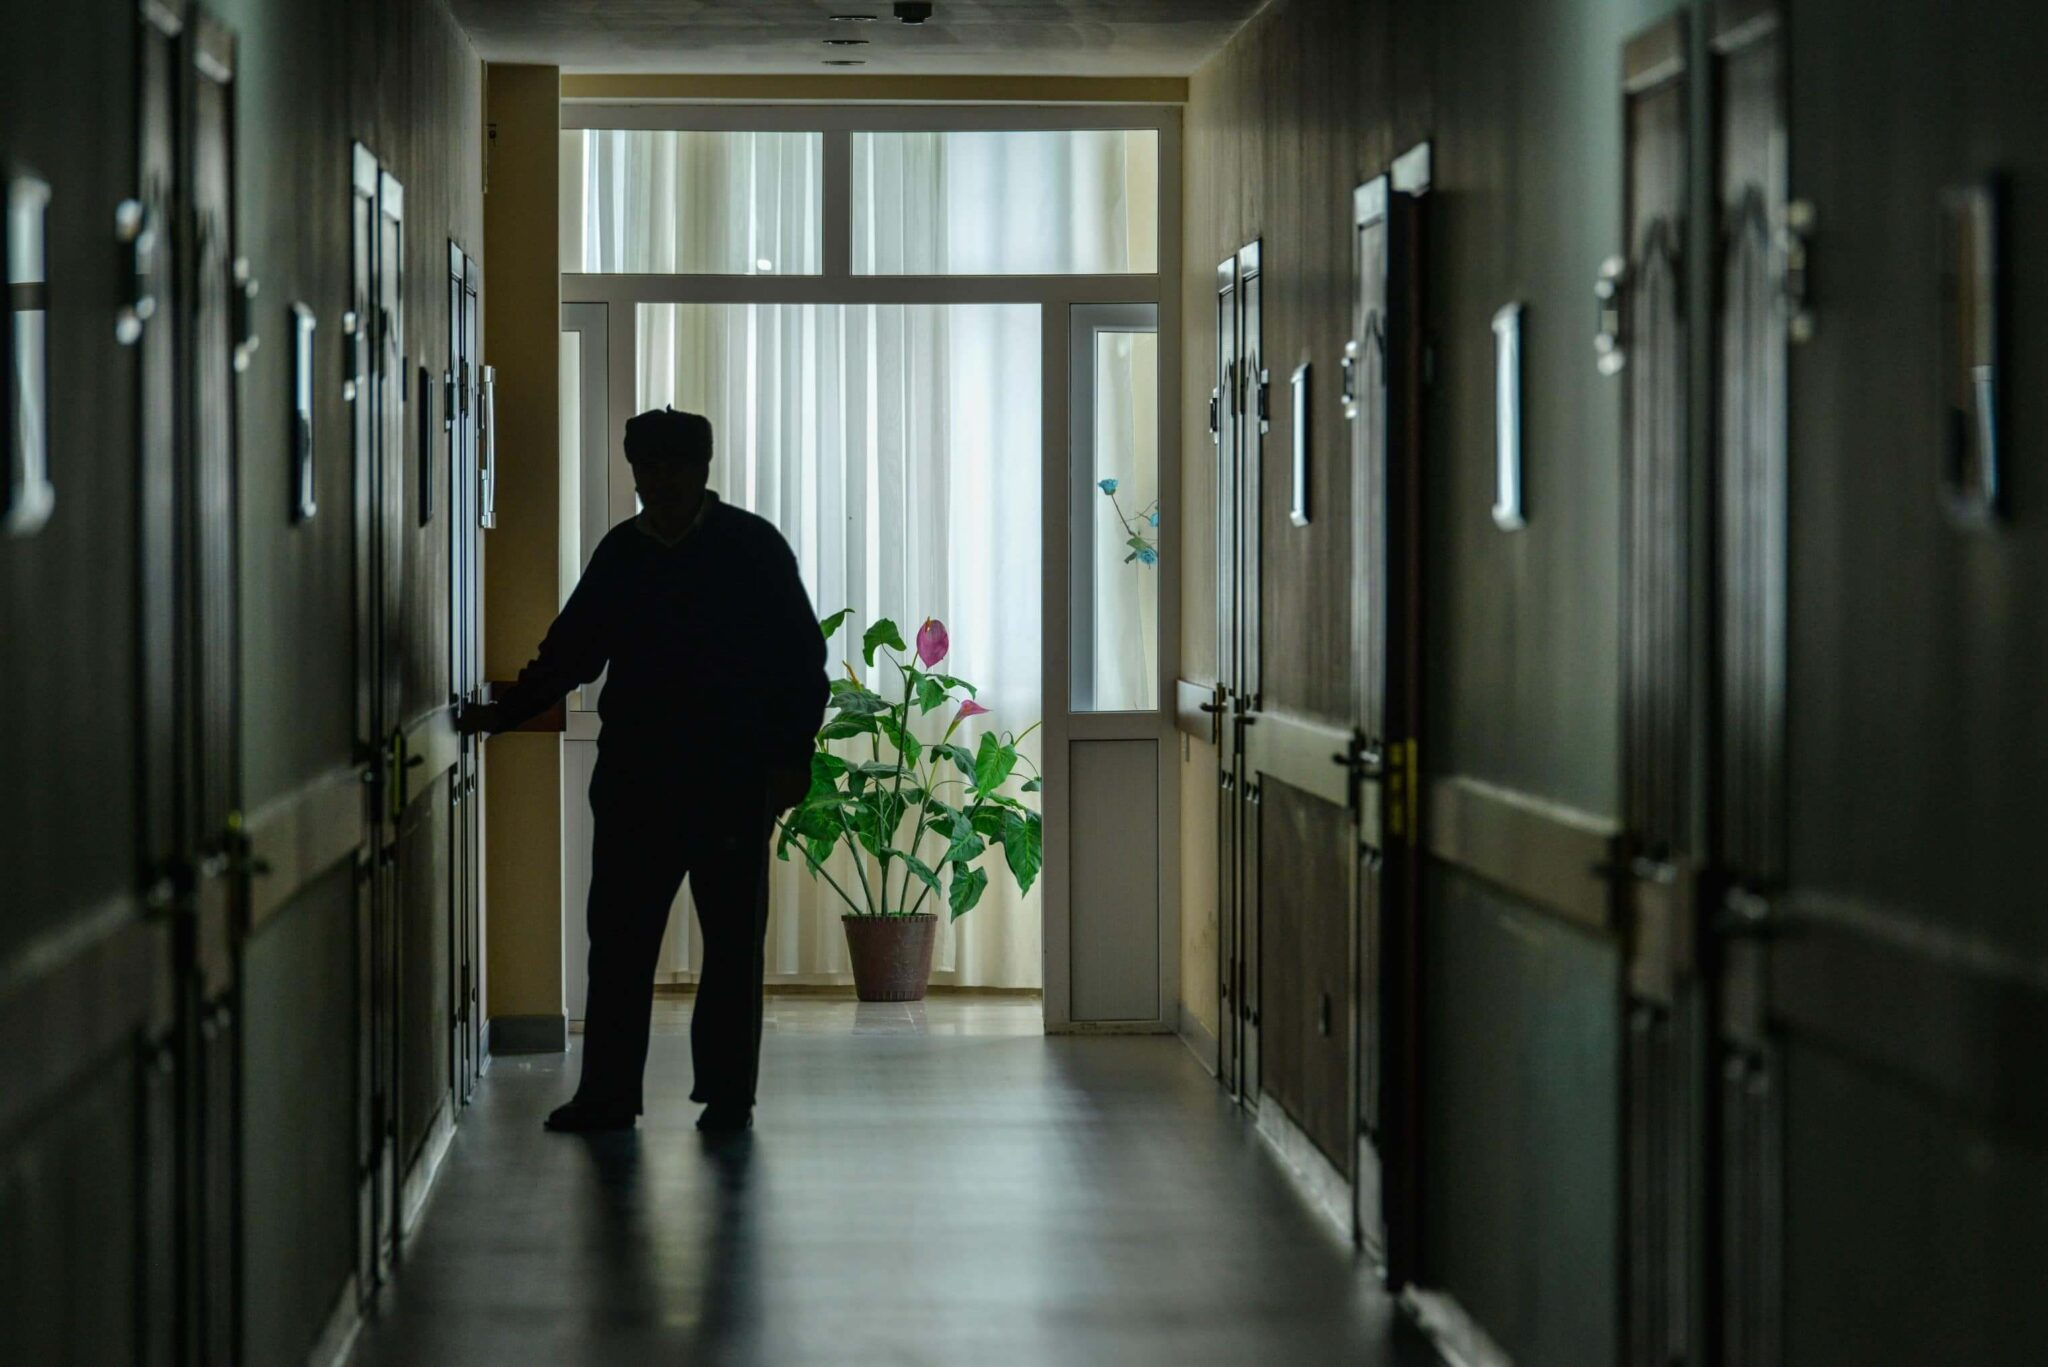 Silhouette of nursing home patient walking down a hallway